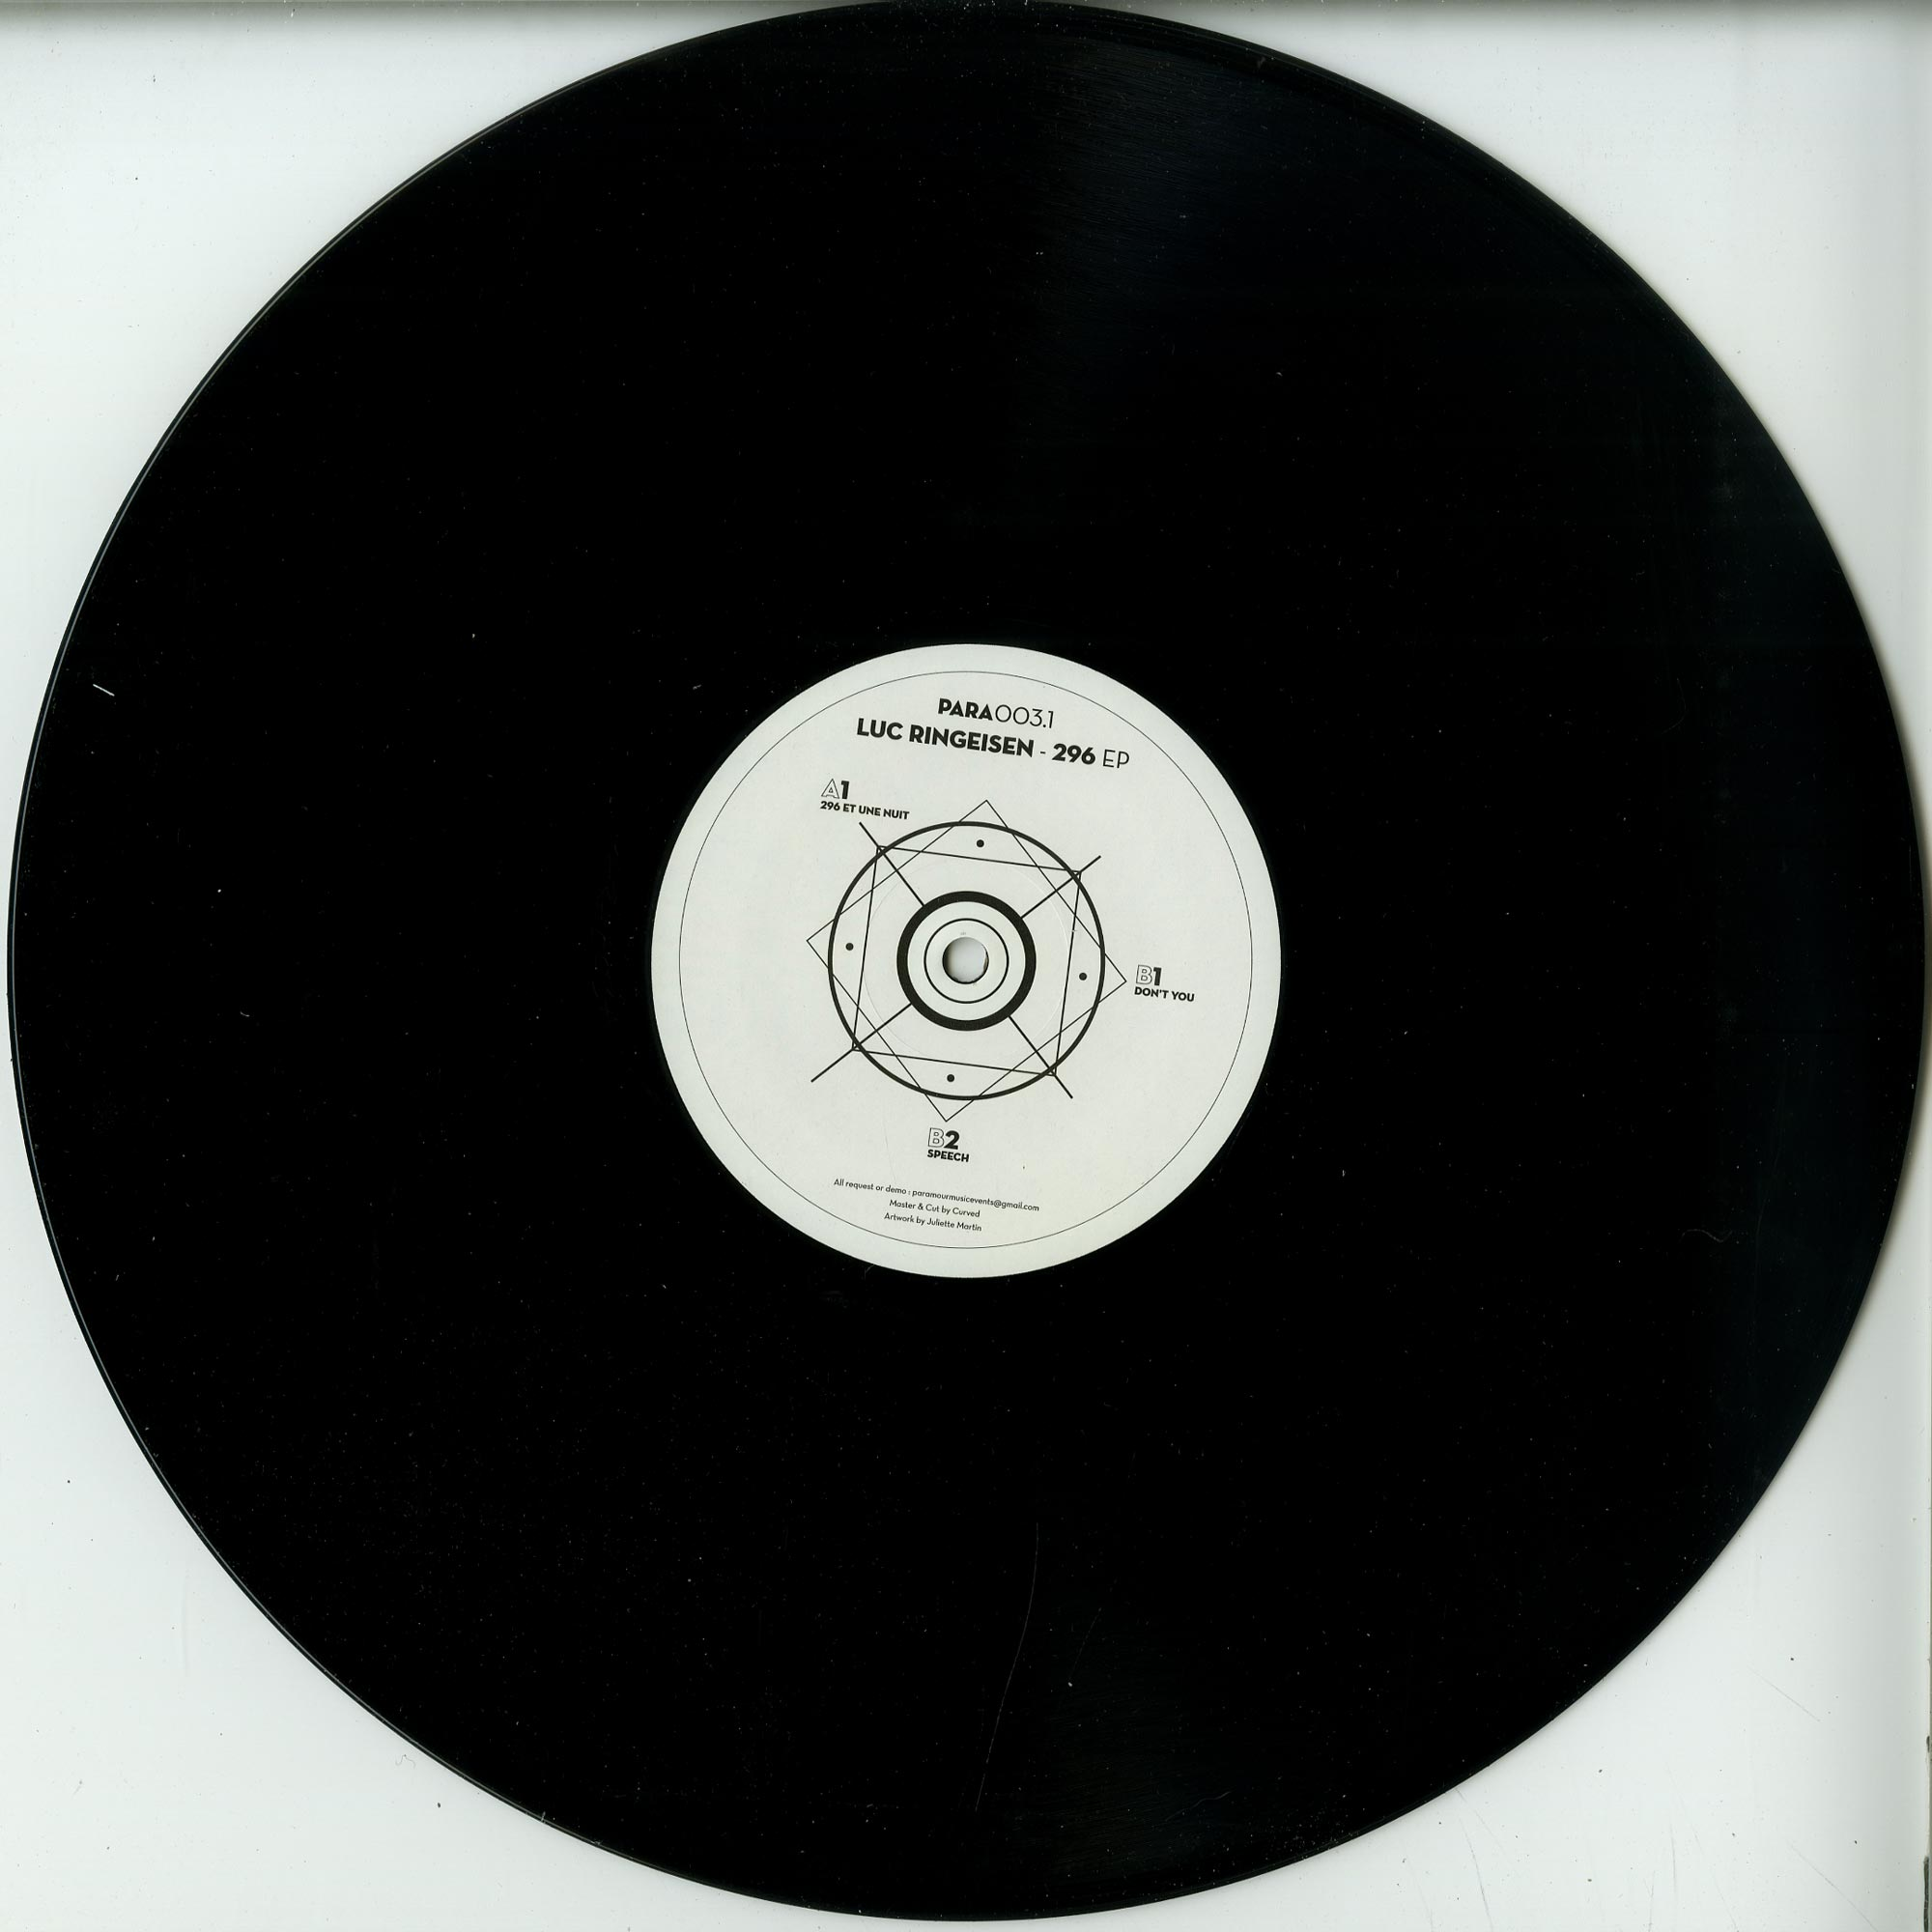 Luc Ringeisen - 296 EP